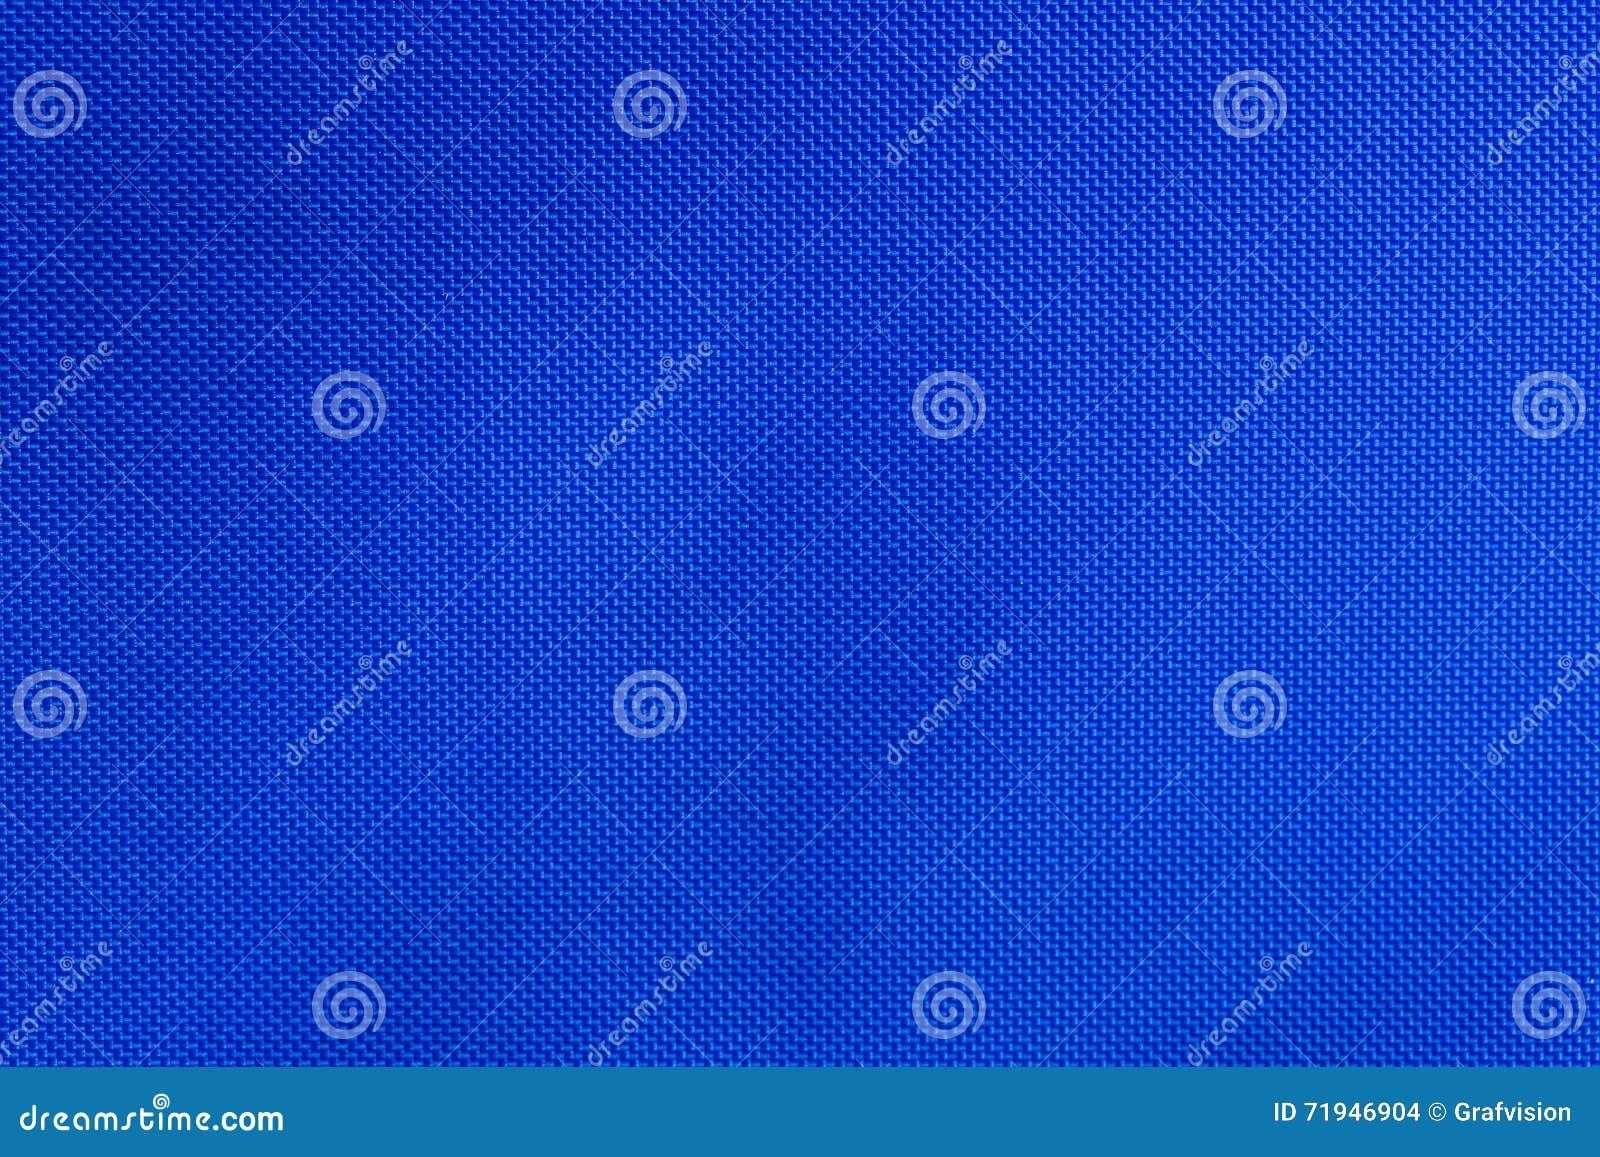 Голубая текстура ткани нейлона